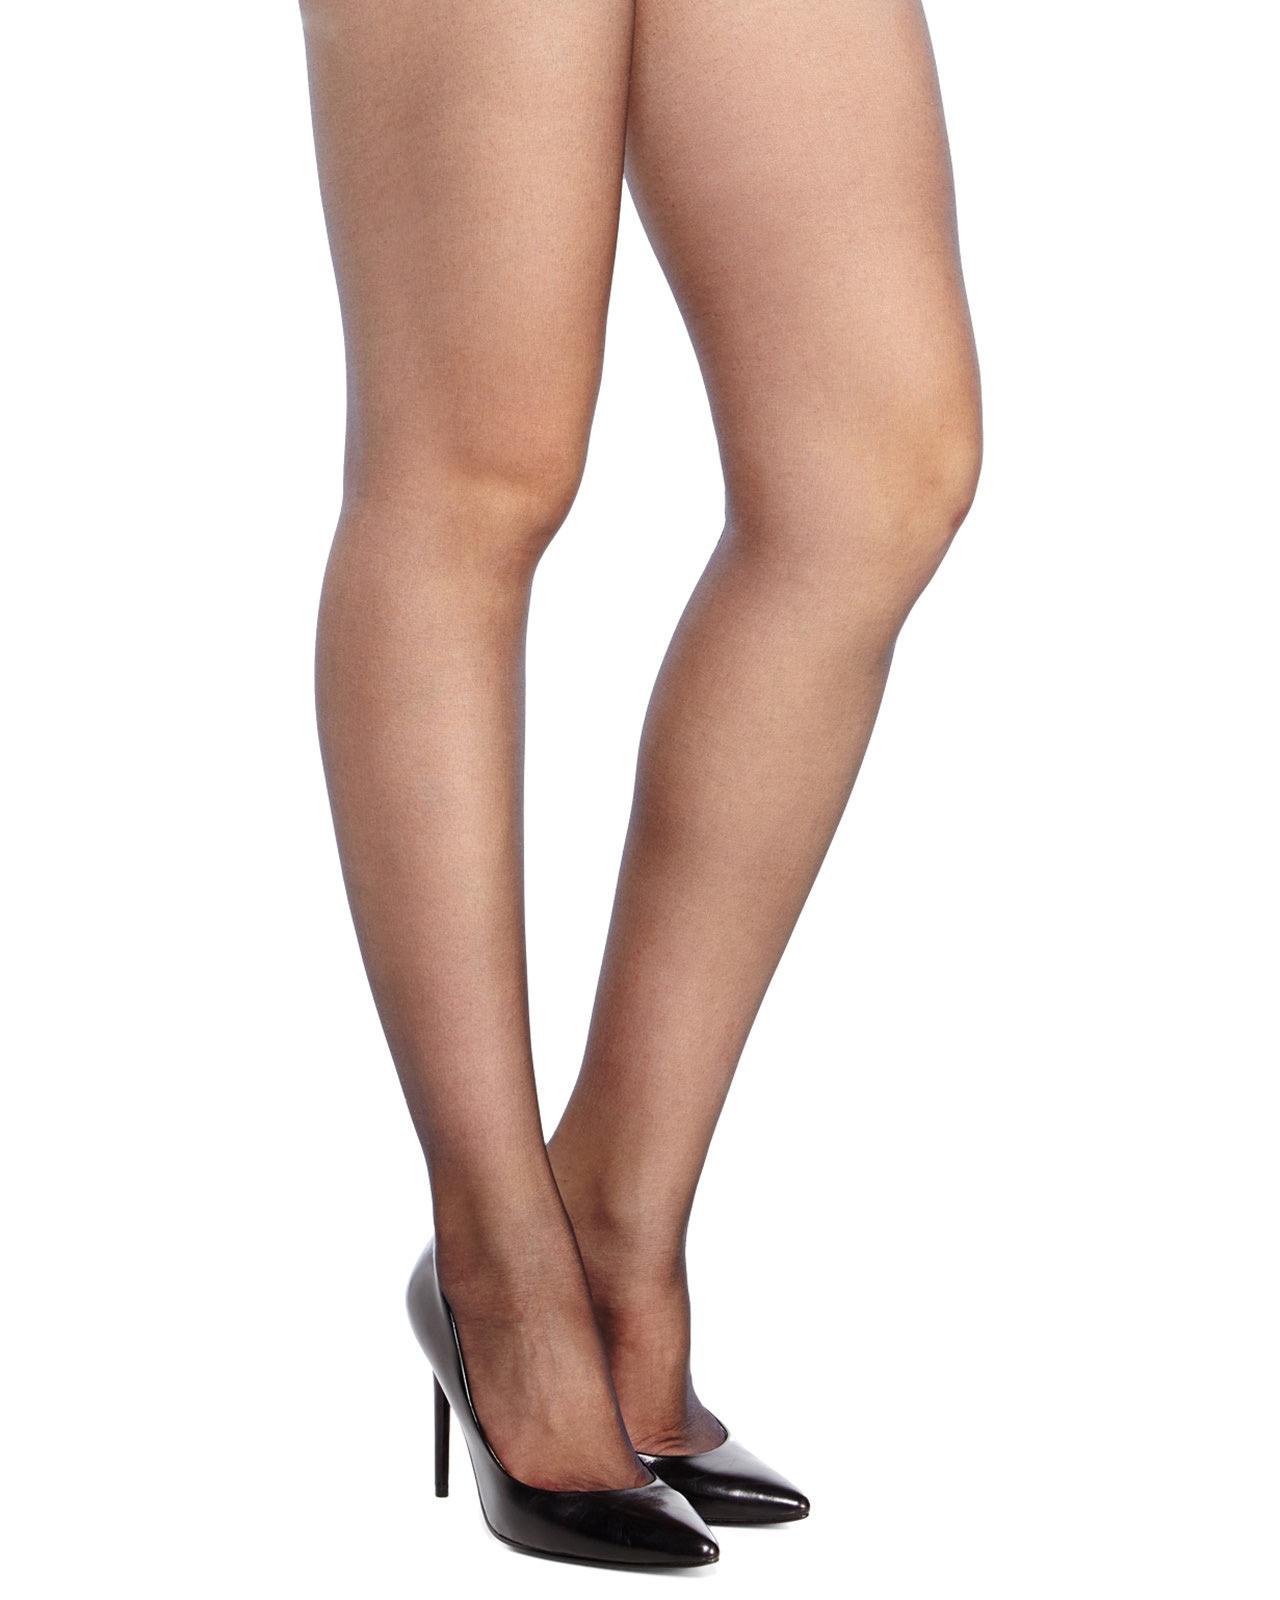 036750f9bacb6 Falke Cuban Heel Sheer Tights in Black - Lyst